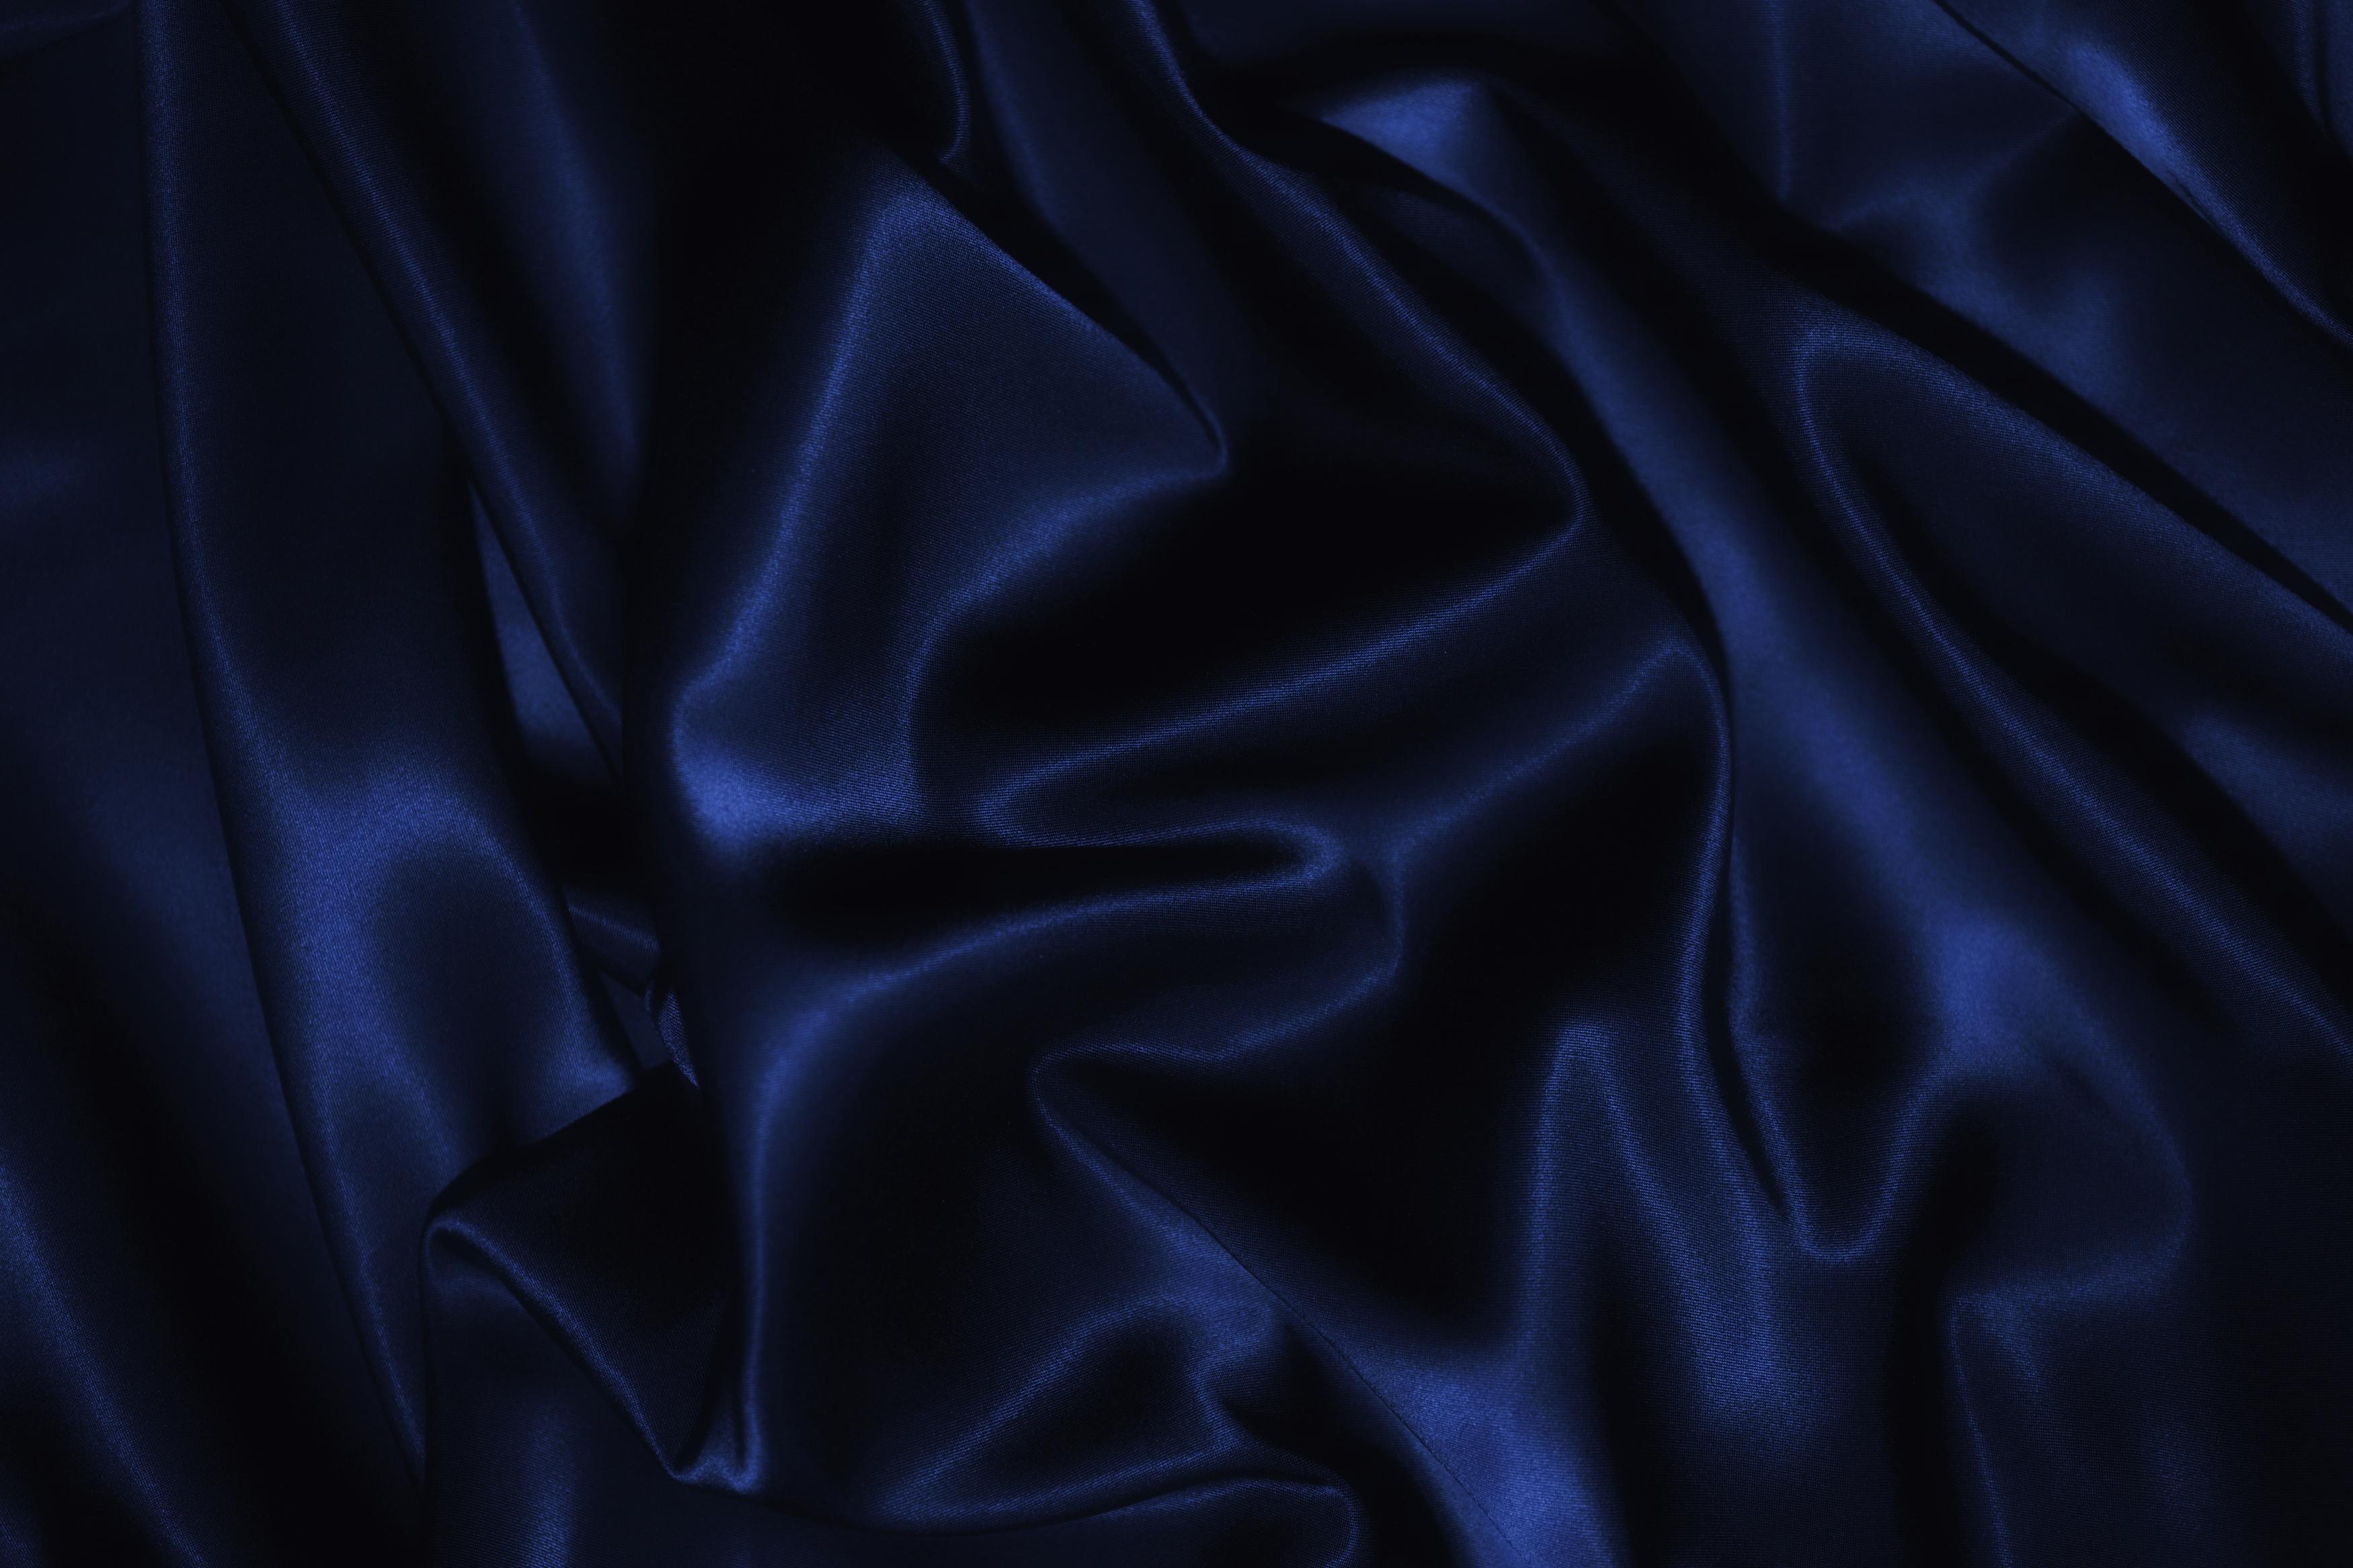 bigstock-Texture-Of-A-Dark-Blue-Silk-8630149.jpg